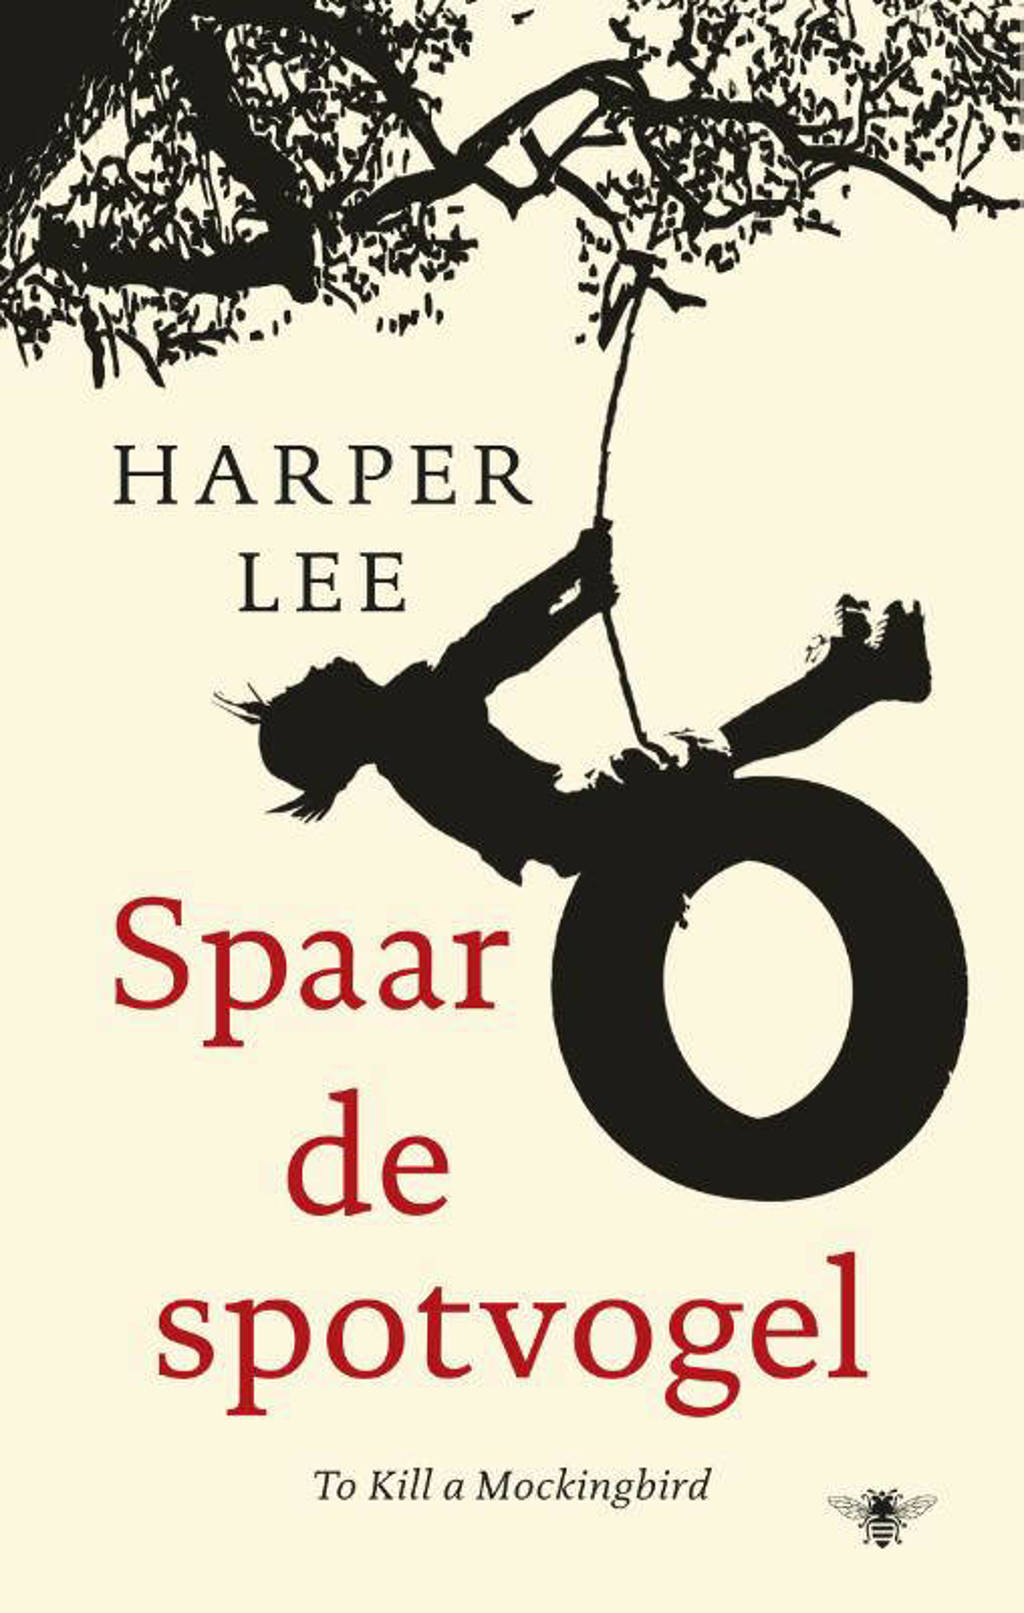 Spaar de spotvogel - Harper Lee